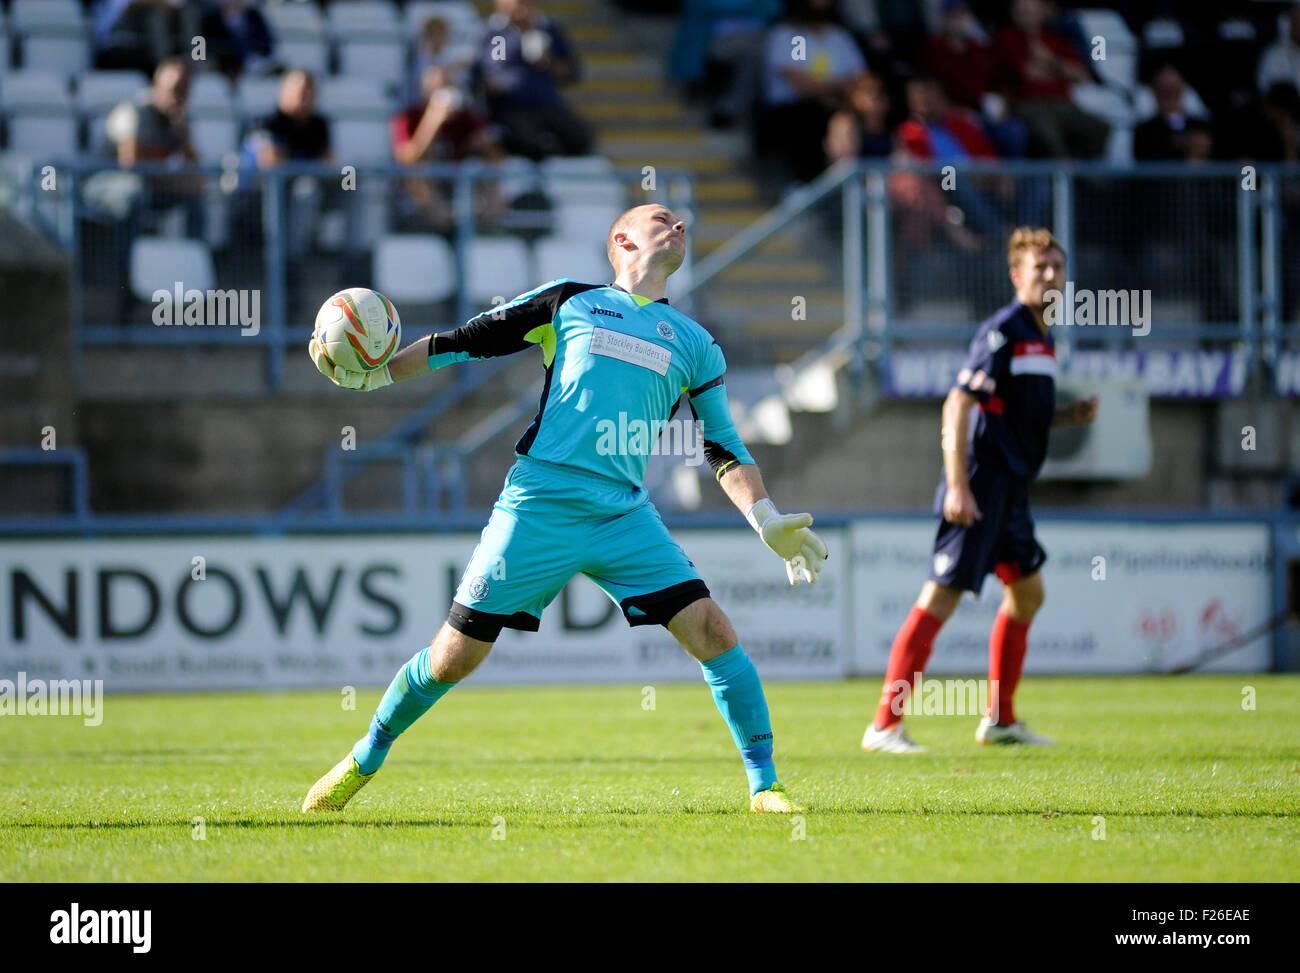 Dorchester, England. 12th September 2015. Goalkepper Alan Walker-Harris in action for Dorchester in The Emirates - Stock Image